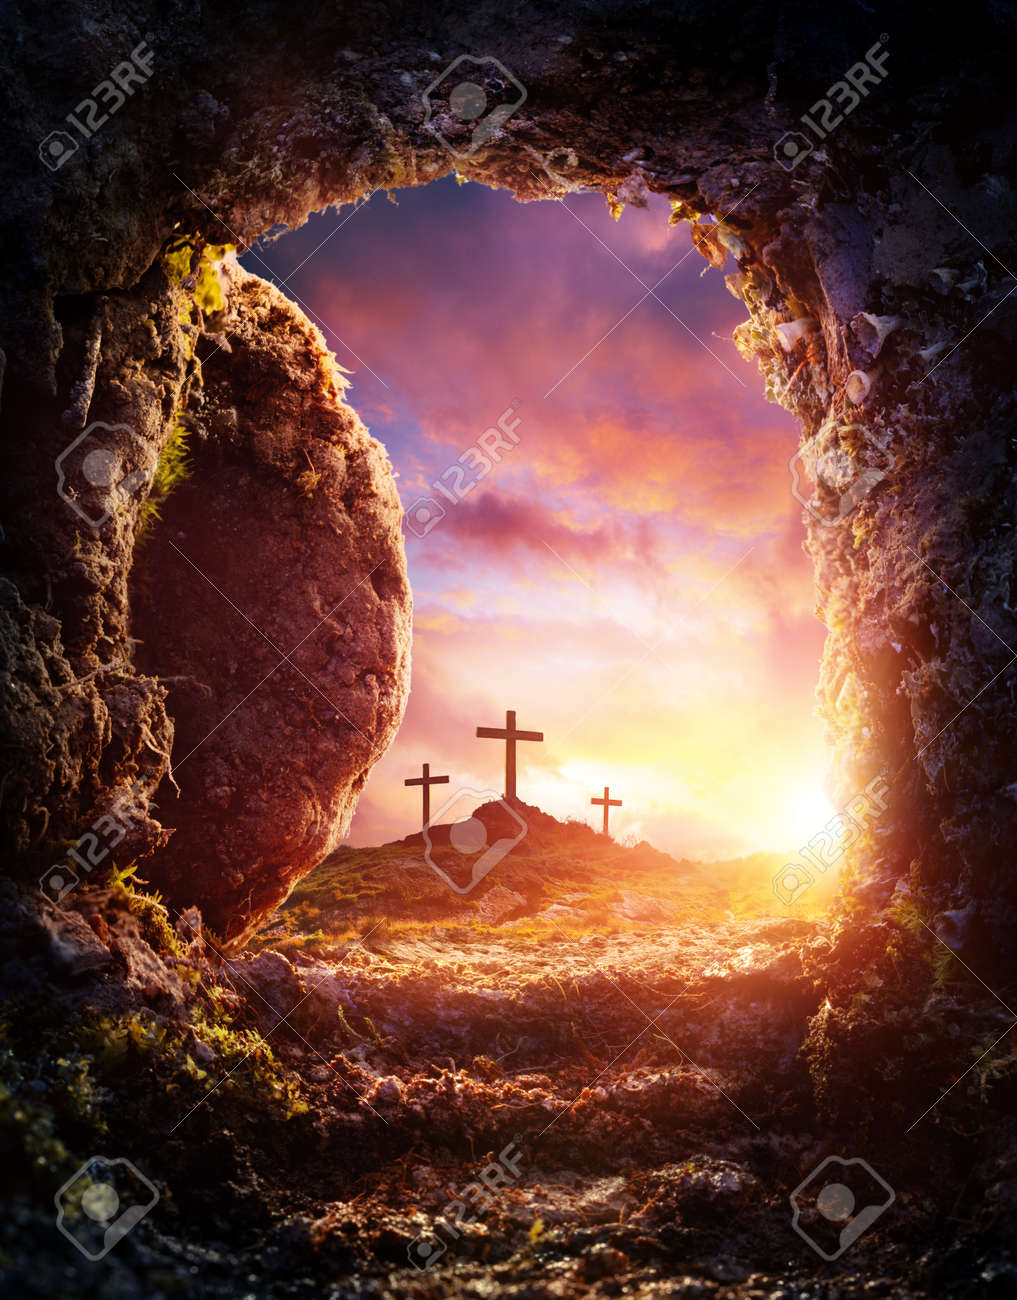 Elegant Empty Tomb   Crucifixion And Resurrection Of Jesus Christ Stock Photo    97199834